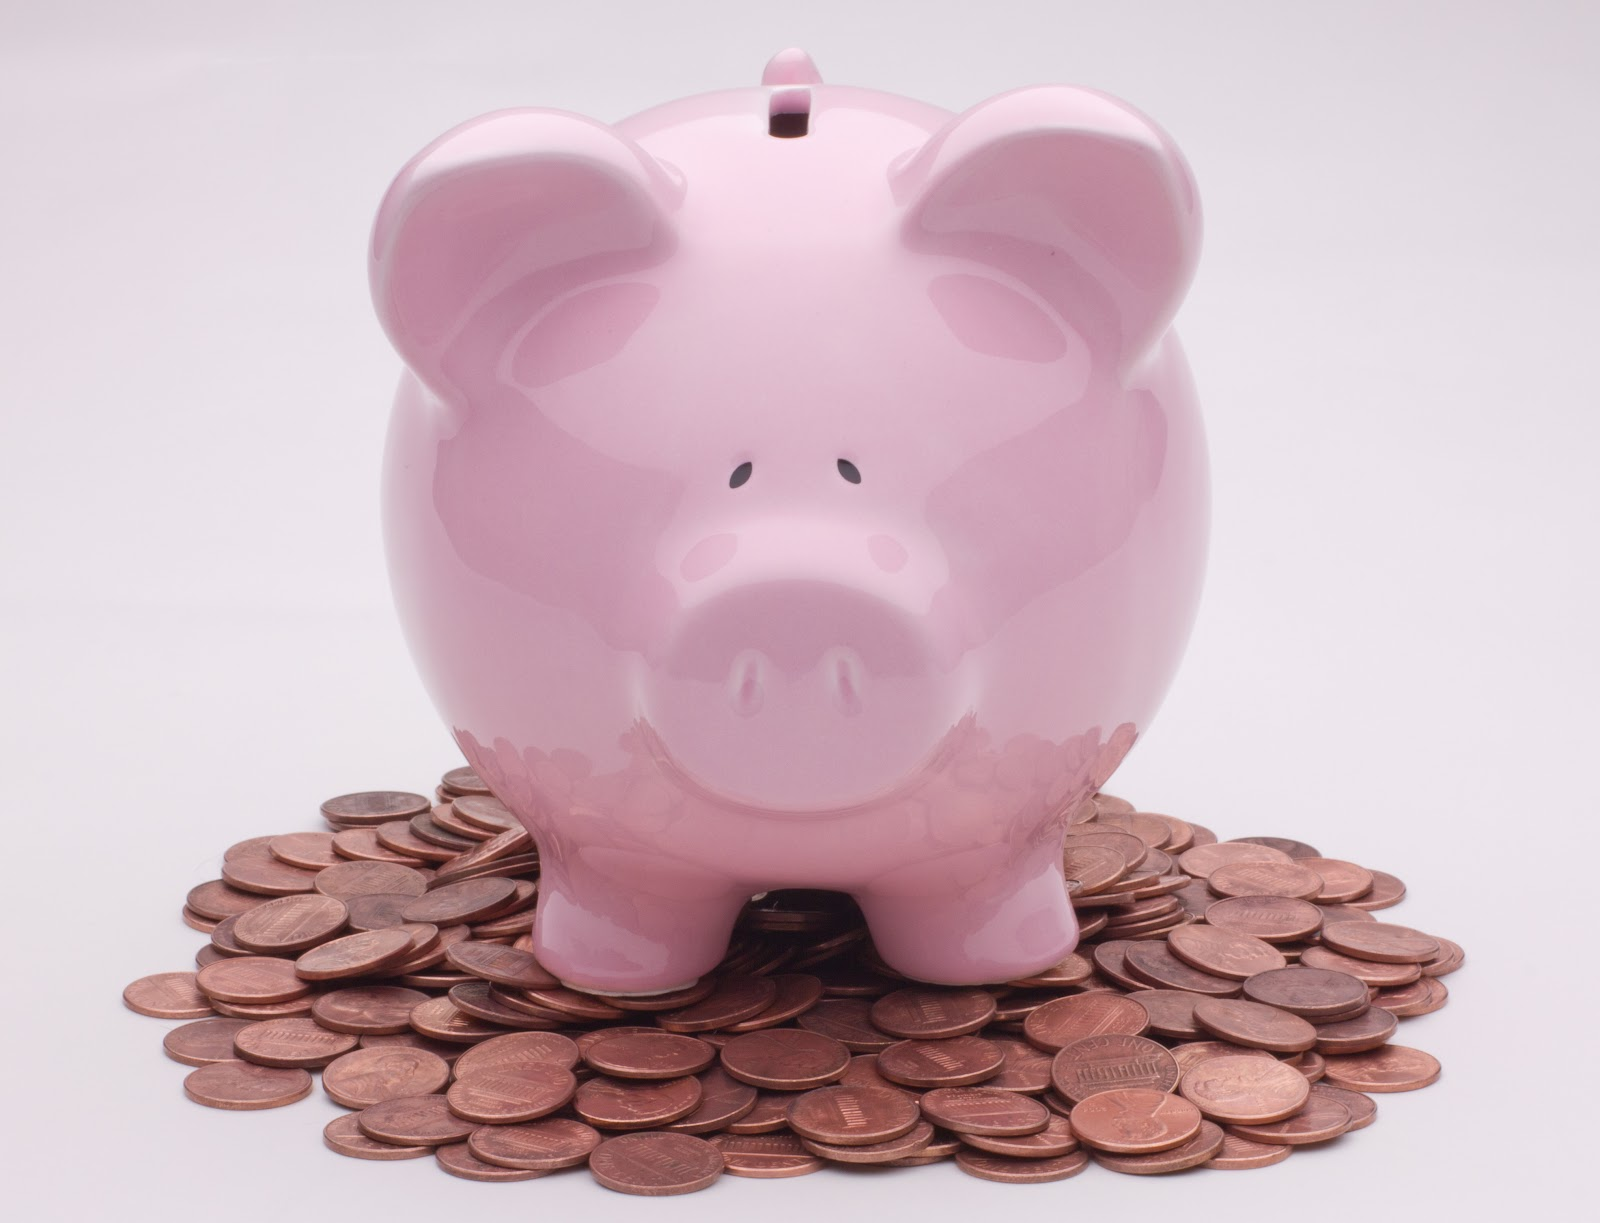 File:Piggy Bank On Pennies (5915295831).jpg - Wikimedia Commons